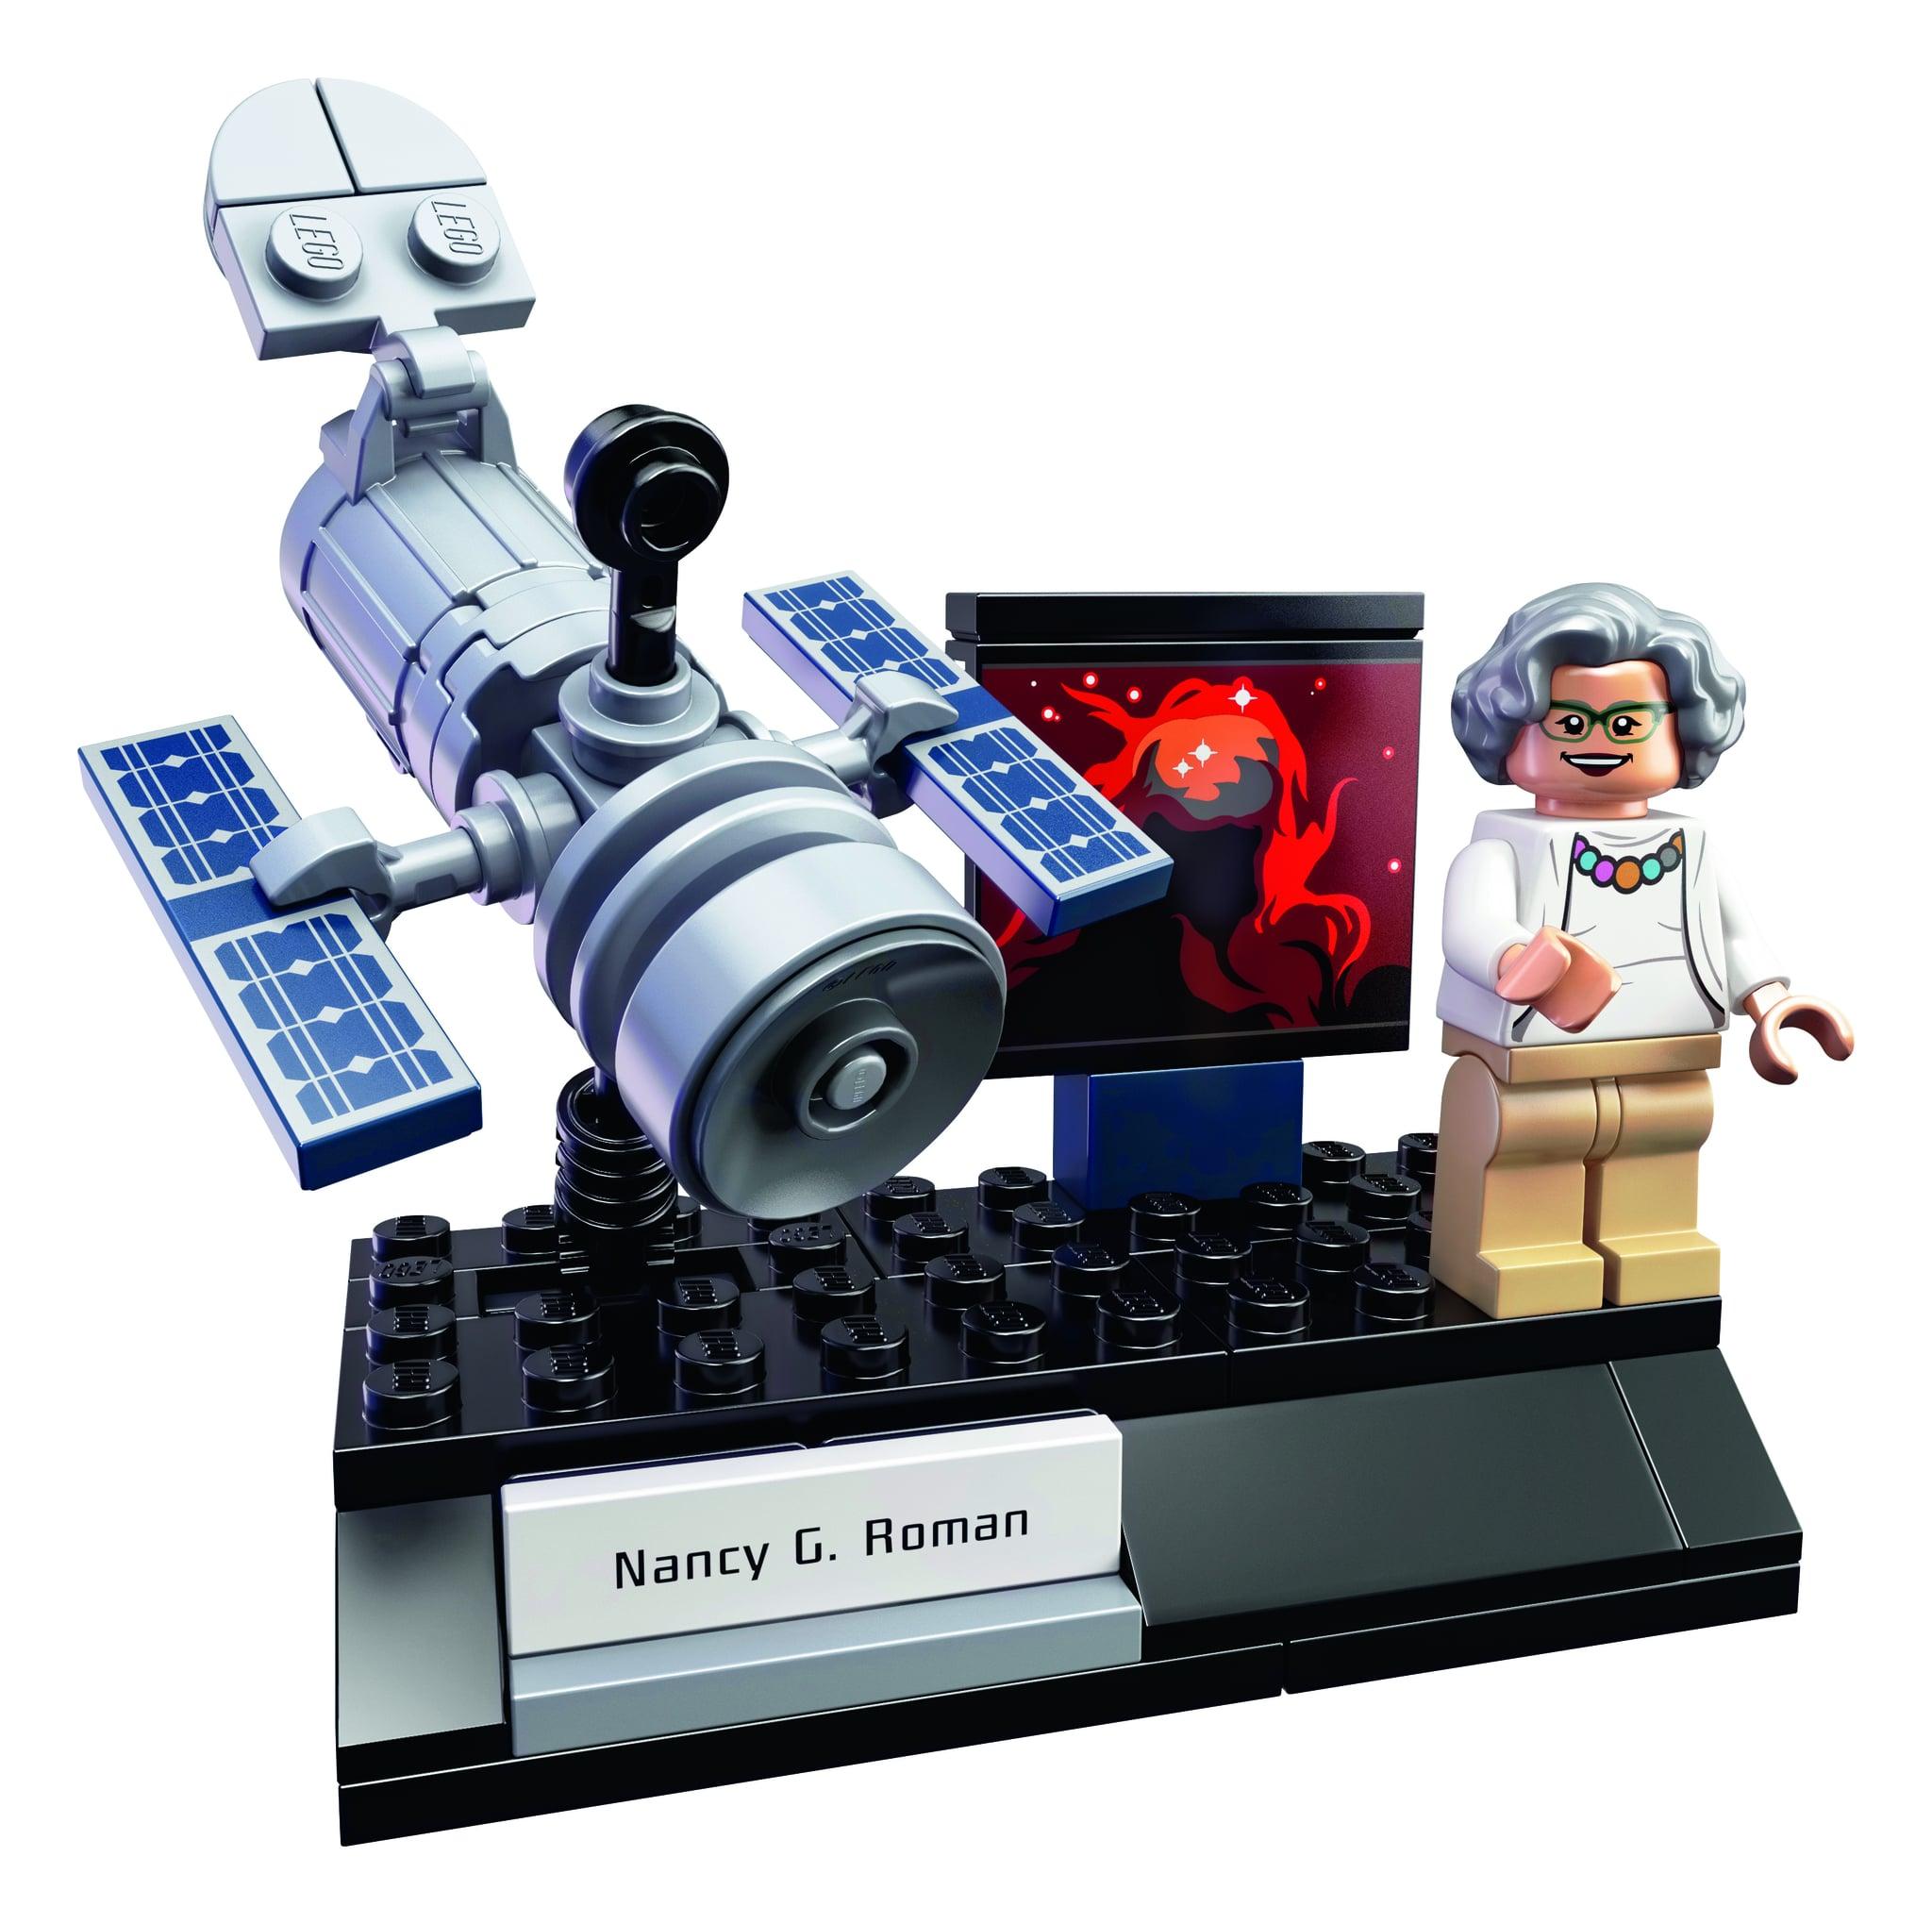 Lego Women of NASA Set STEM and Science November 2017 ...